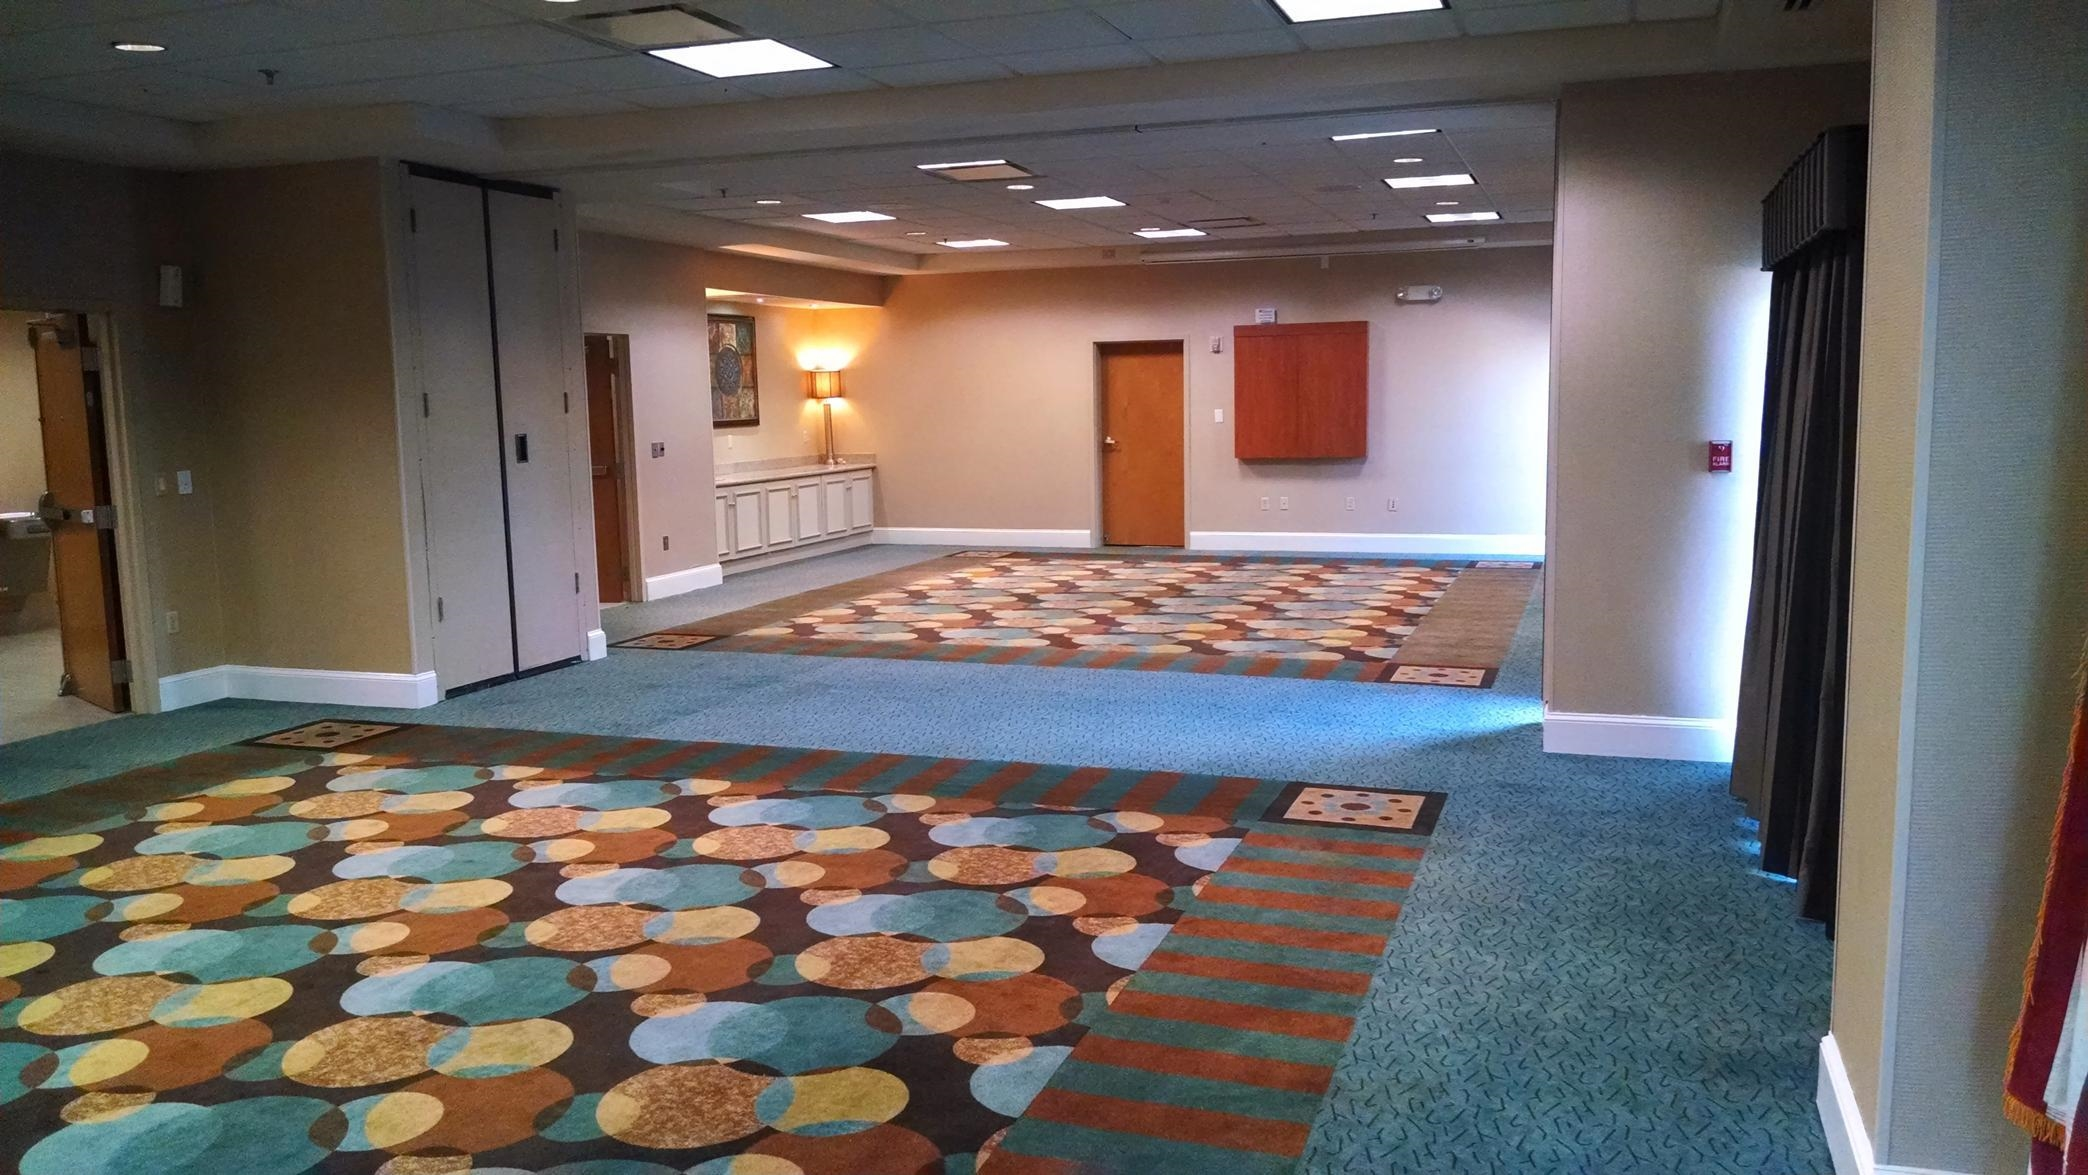 Hilton Garden Inn Nashville Airport image 24